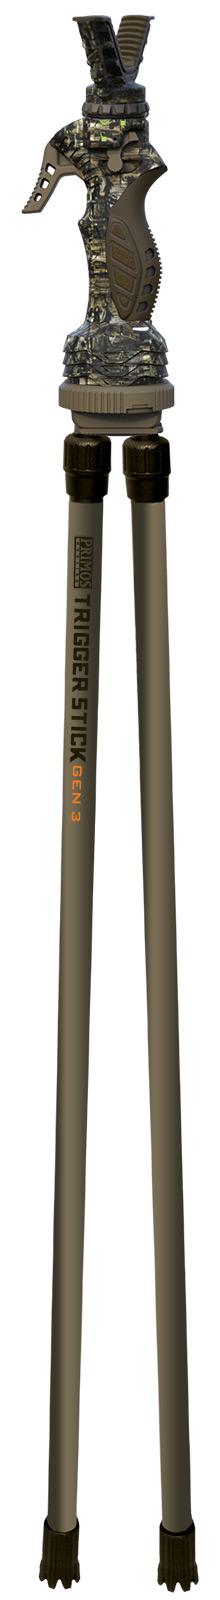 Primos Trigger Stick Bi-pod Gen III